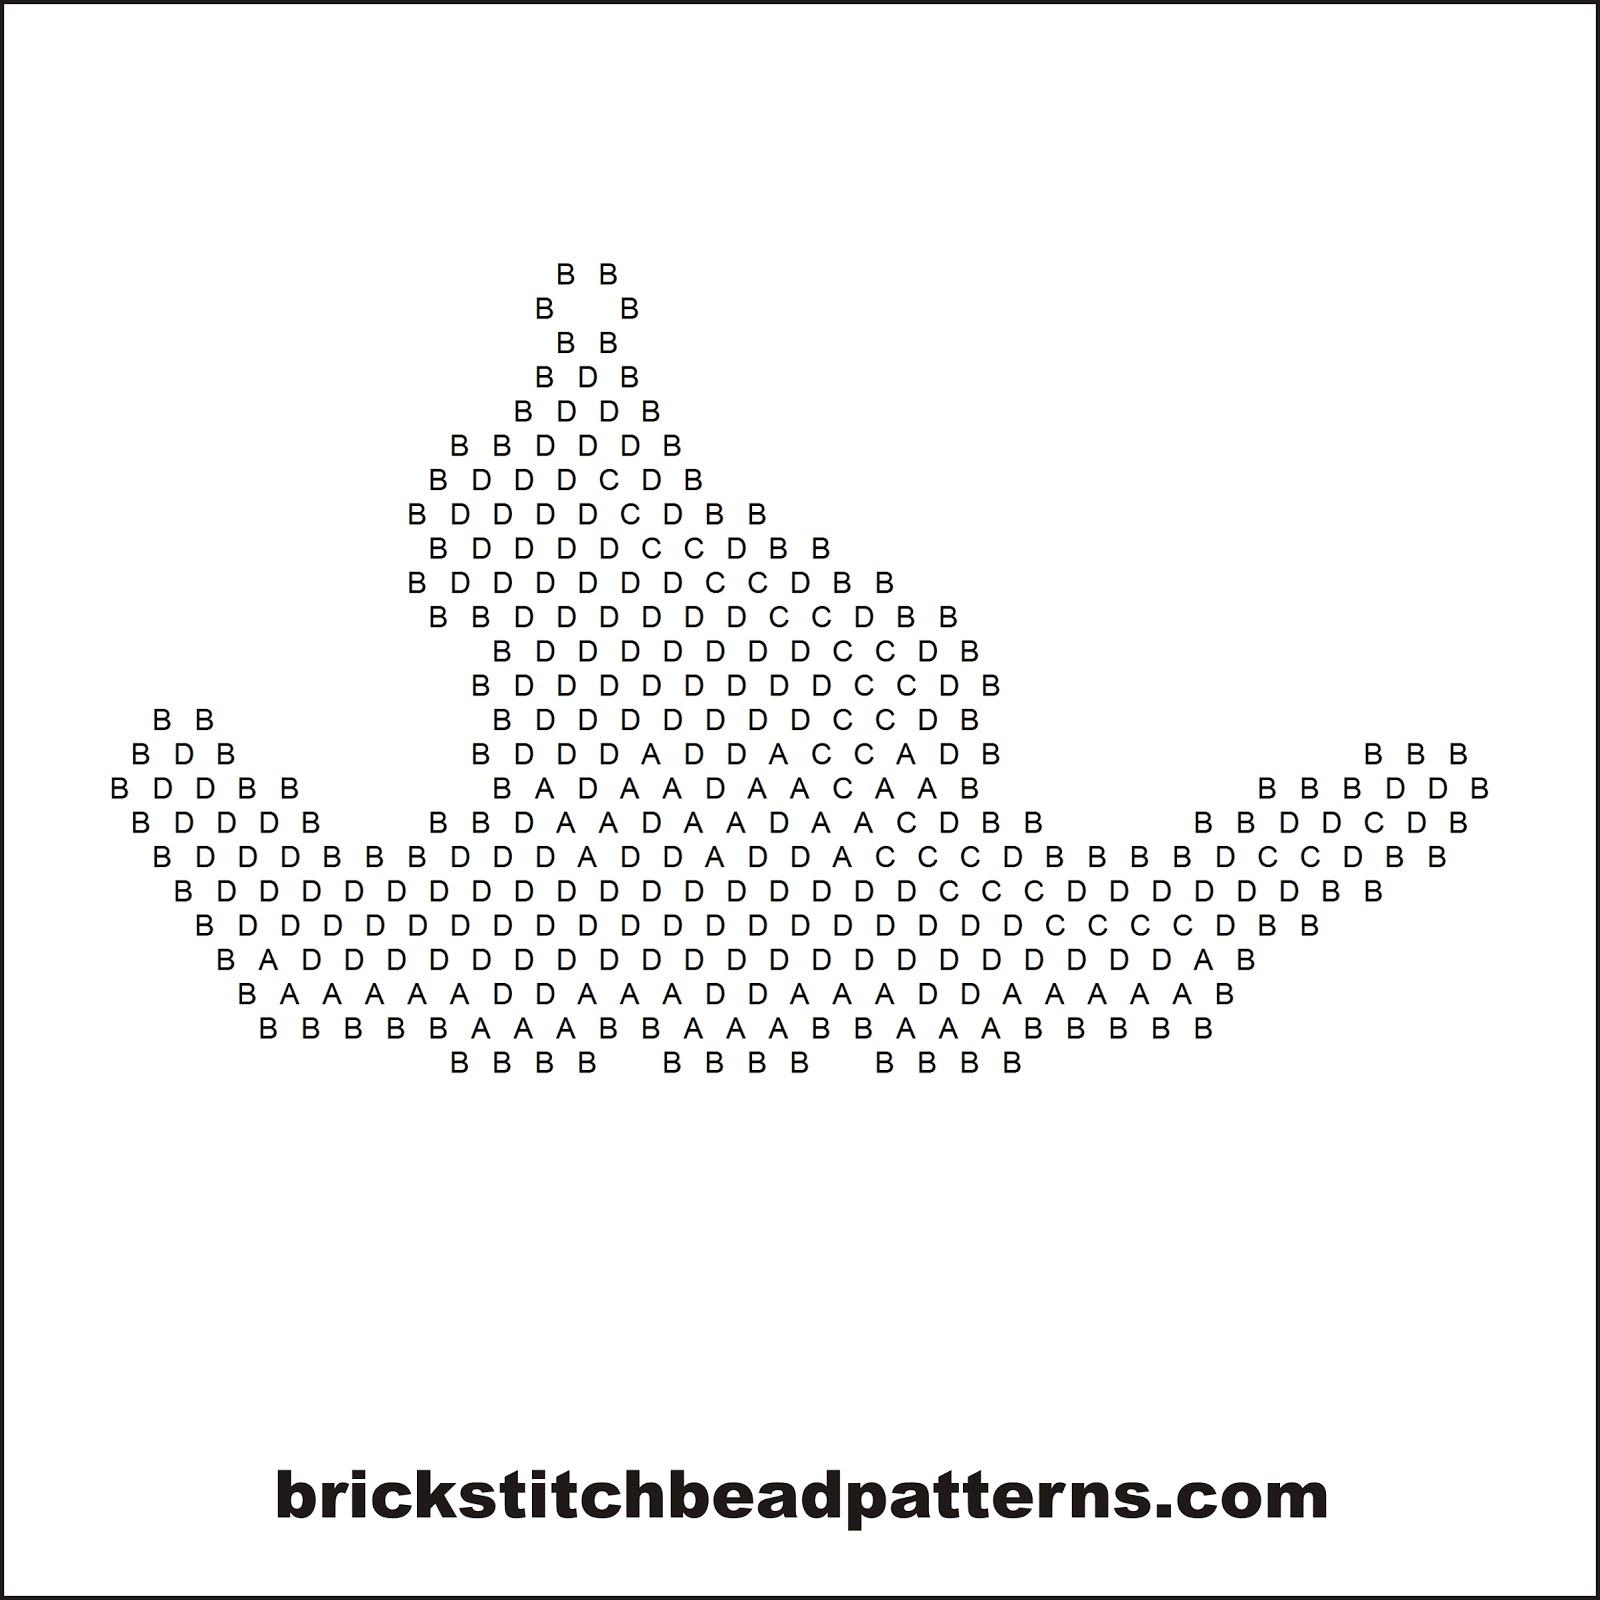 Brick Stitch Bead Patterns Journal: Crooked Witch Hat